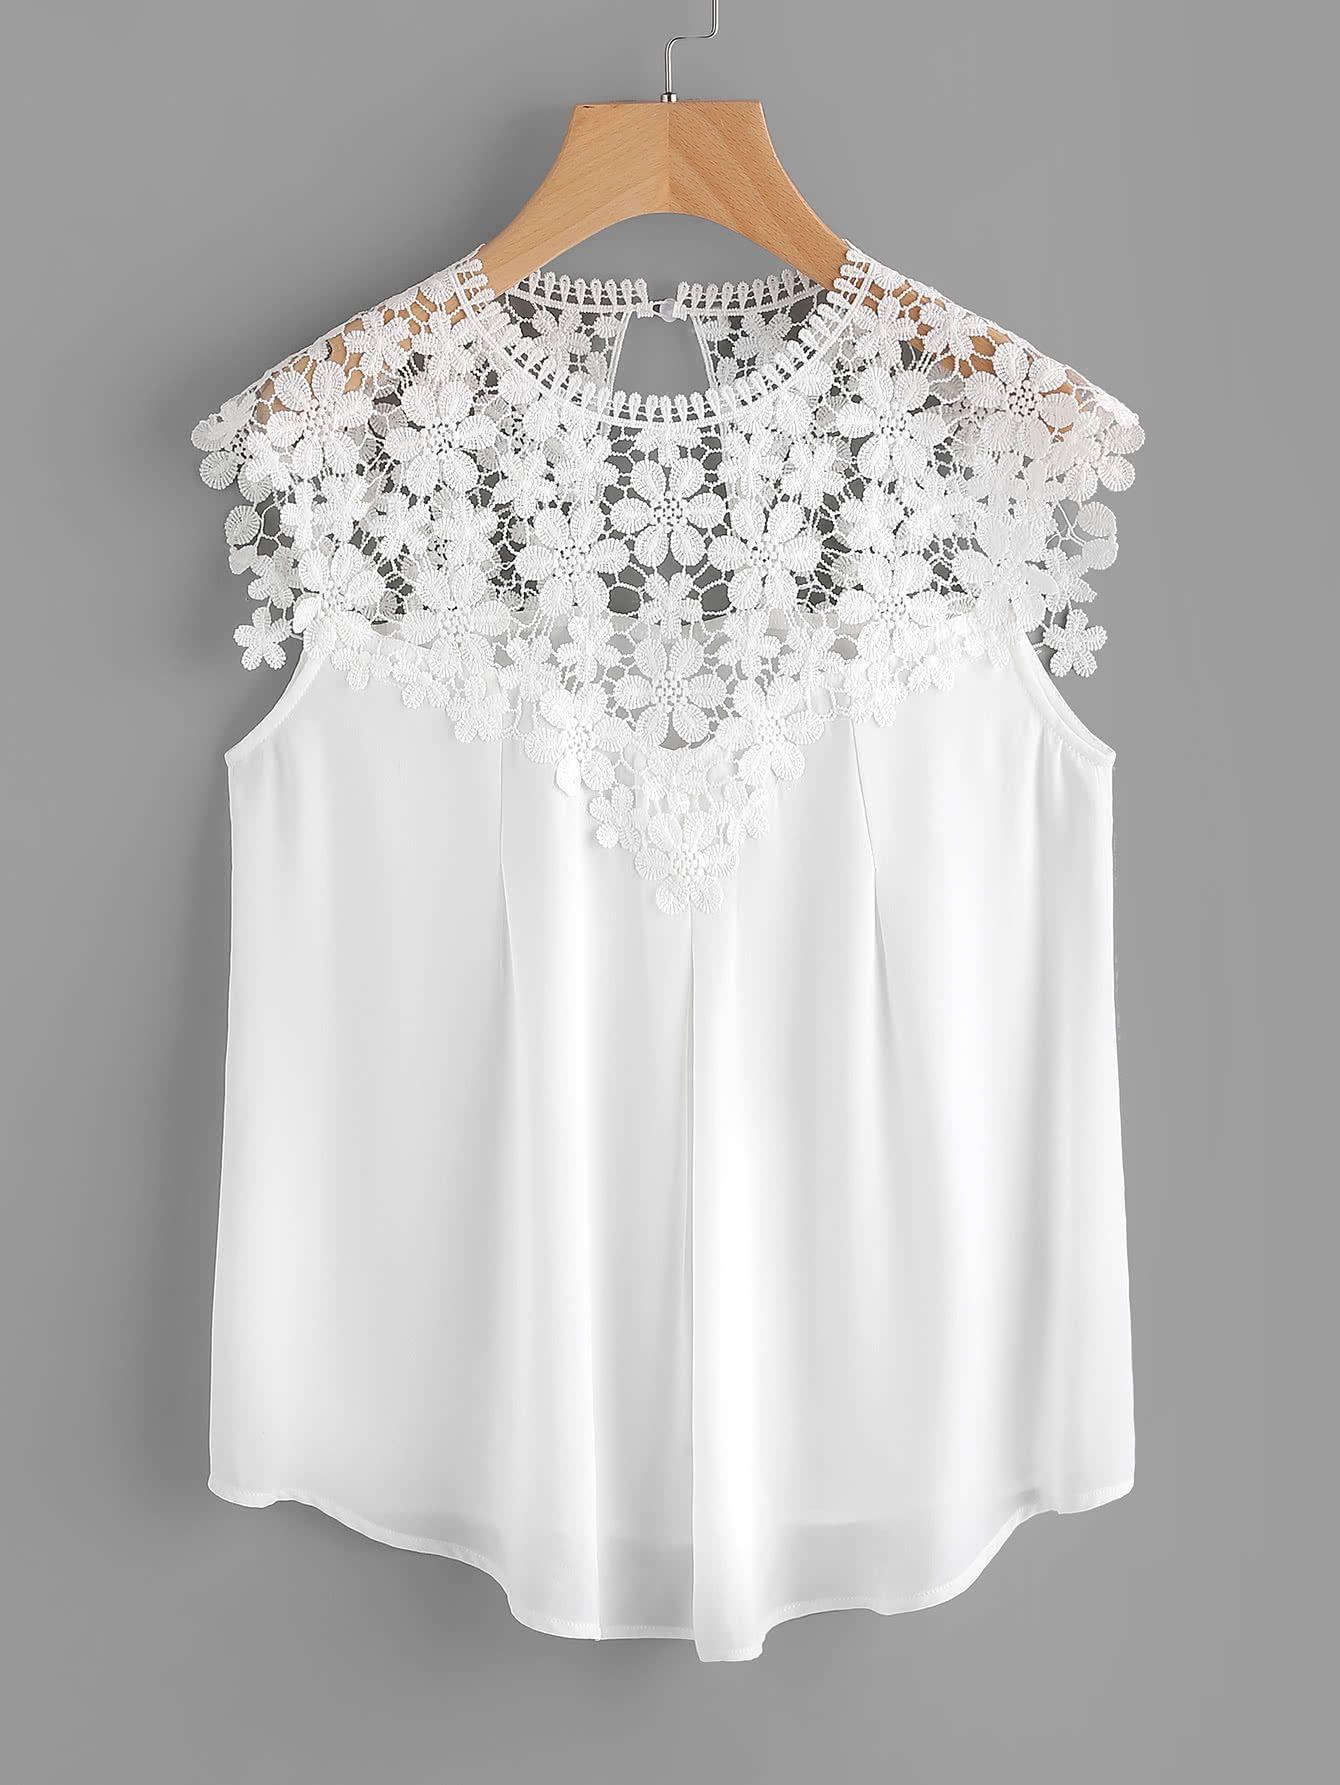 13c26fdee0 Shop Keyhole Back Daisy Lace Shoulder Shell Top online. SheIn offers  Keyhole Back Daisy Lace Shoulder Shell Top & more to fit your fashionable  needs.